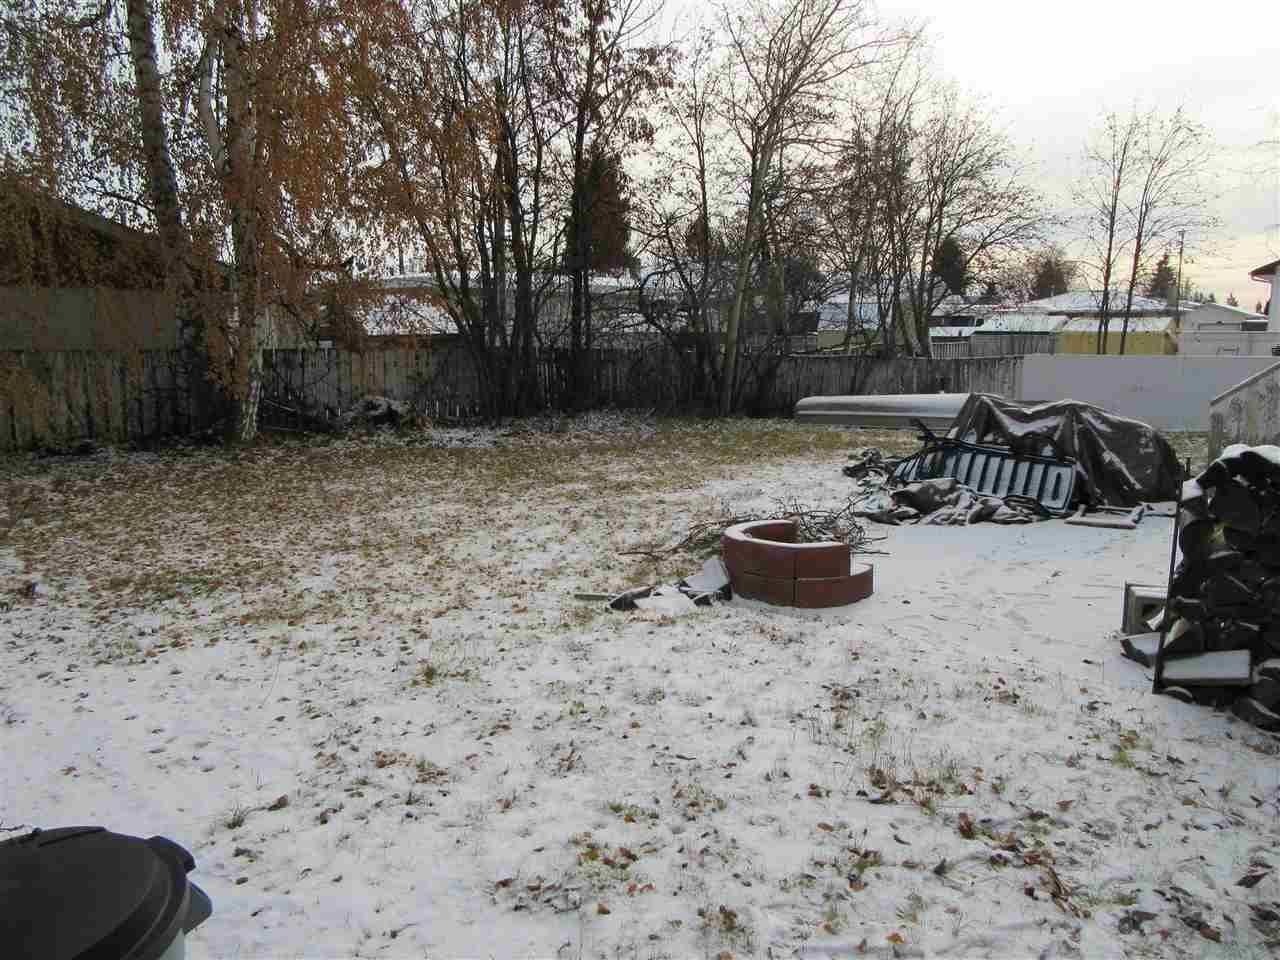 Photo 17: Photos: 522 RADCLIFFE Drive: Quinson House for sale (PG City West (Zone 71))  : MLS®# R2433646